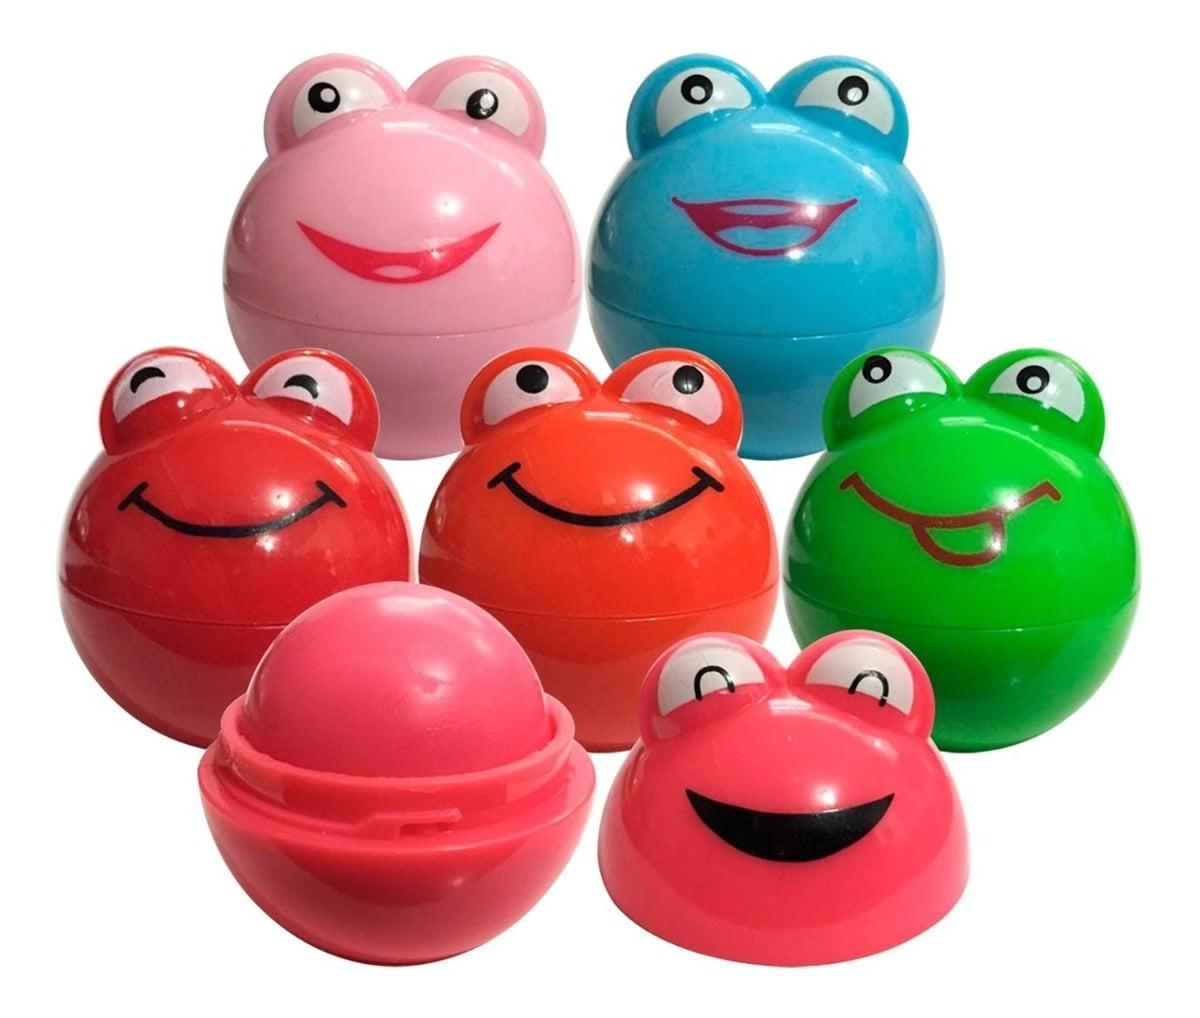 6 Lip Balm Hidratante Protetor Labial Bfashion Sapinho